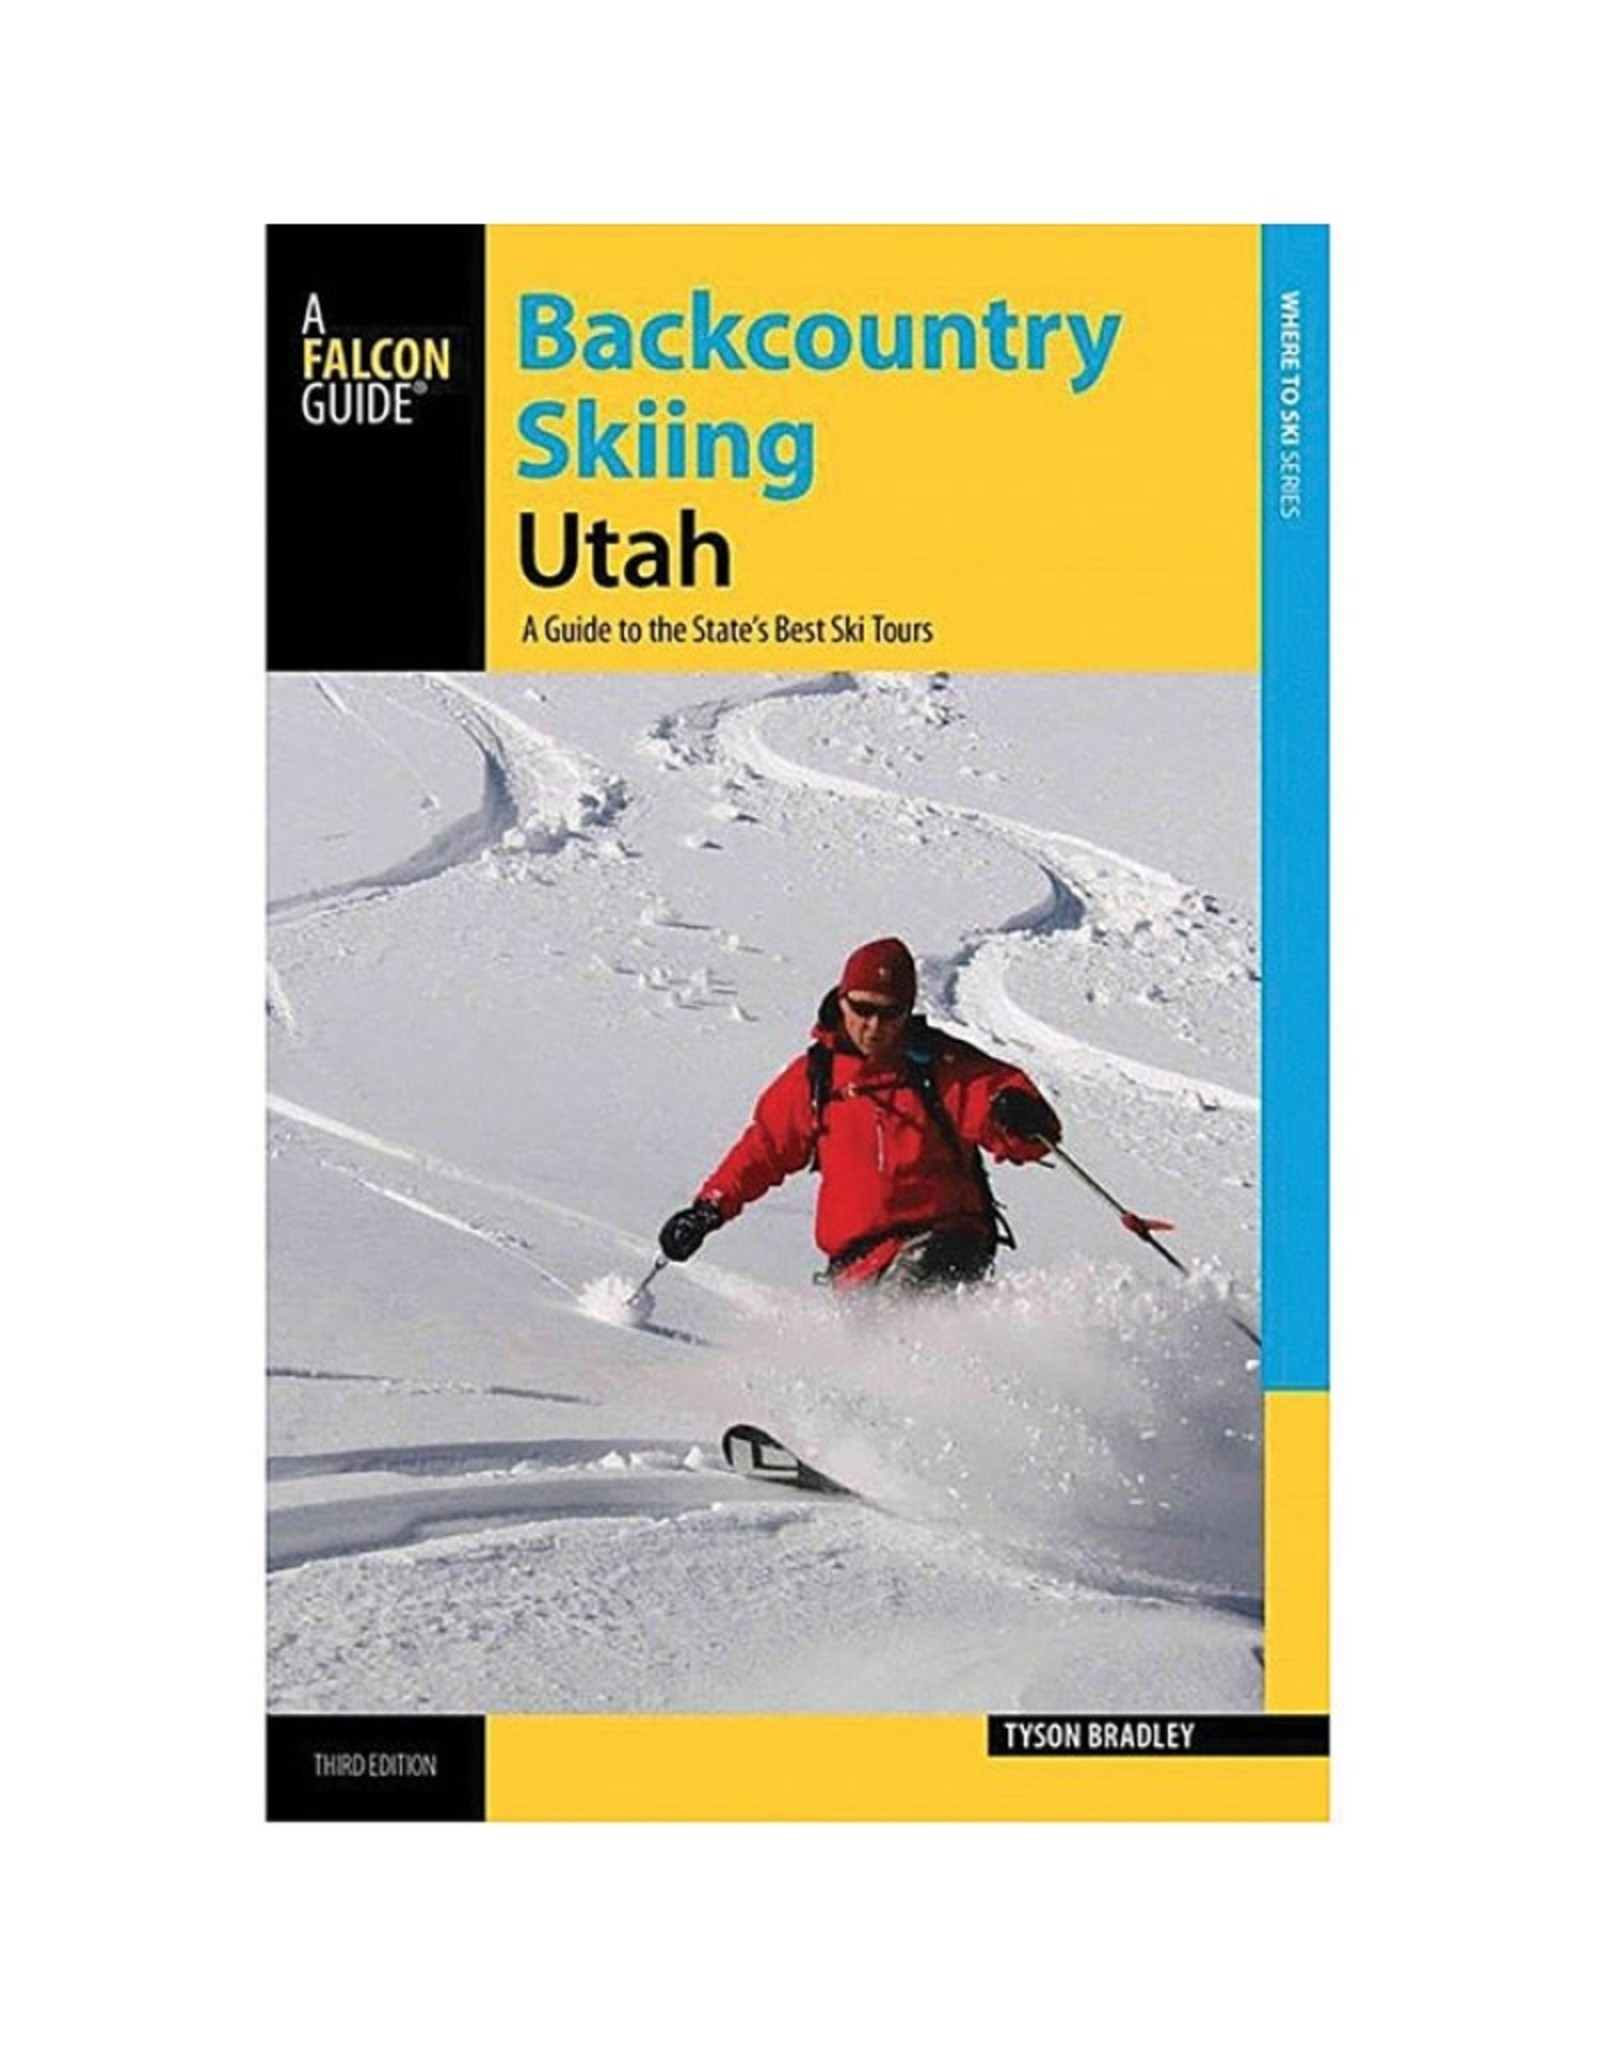 Falcon Guides Backcountry Skiing Utah Guidebook